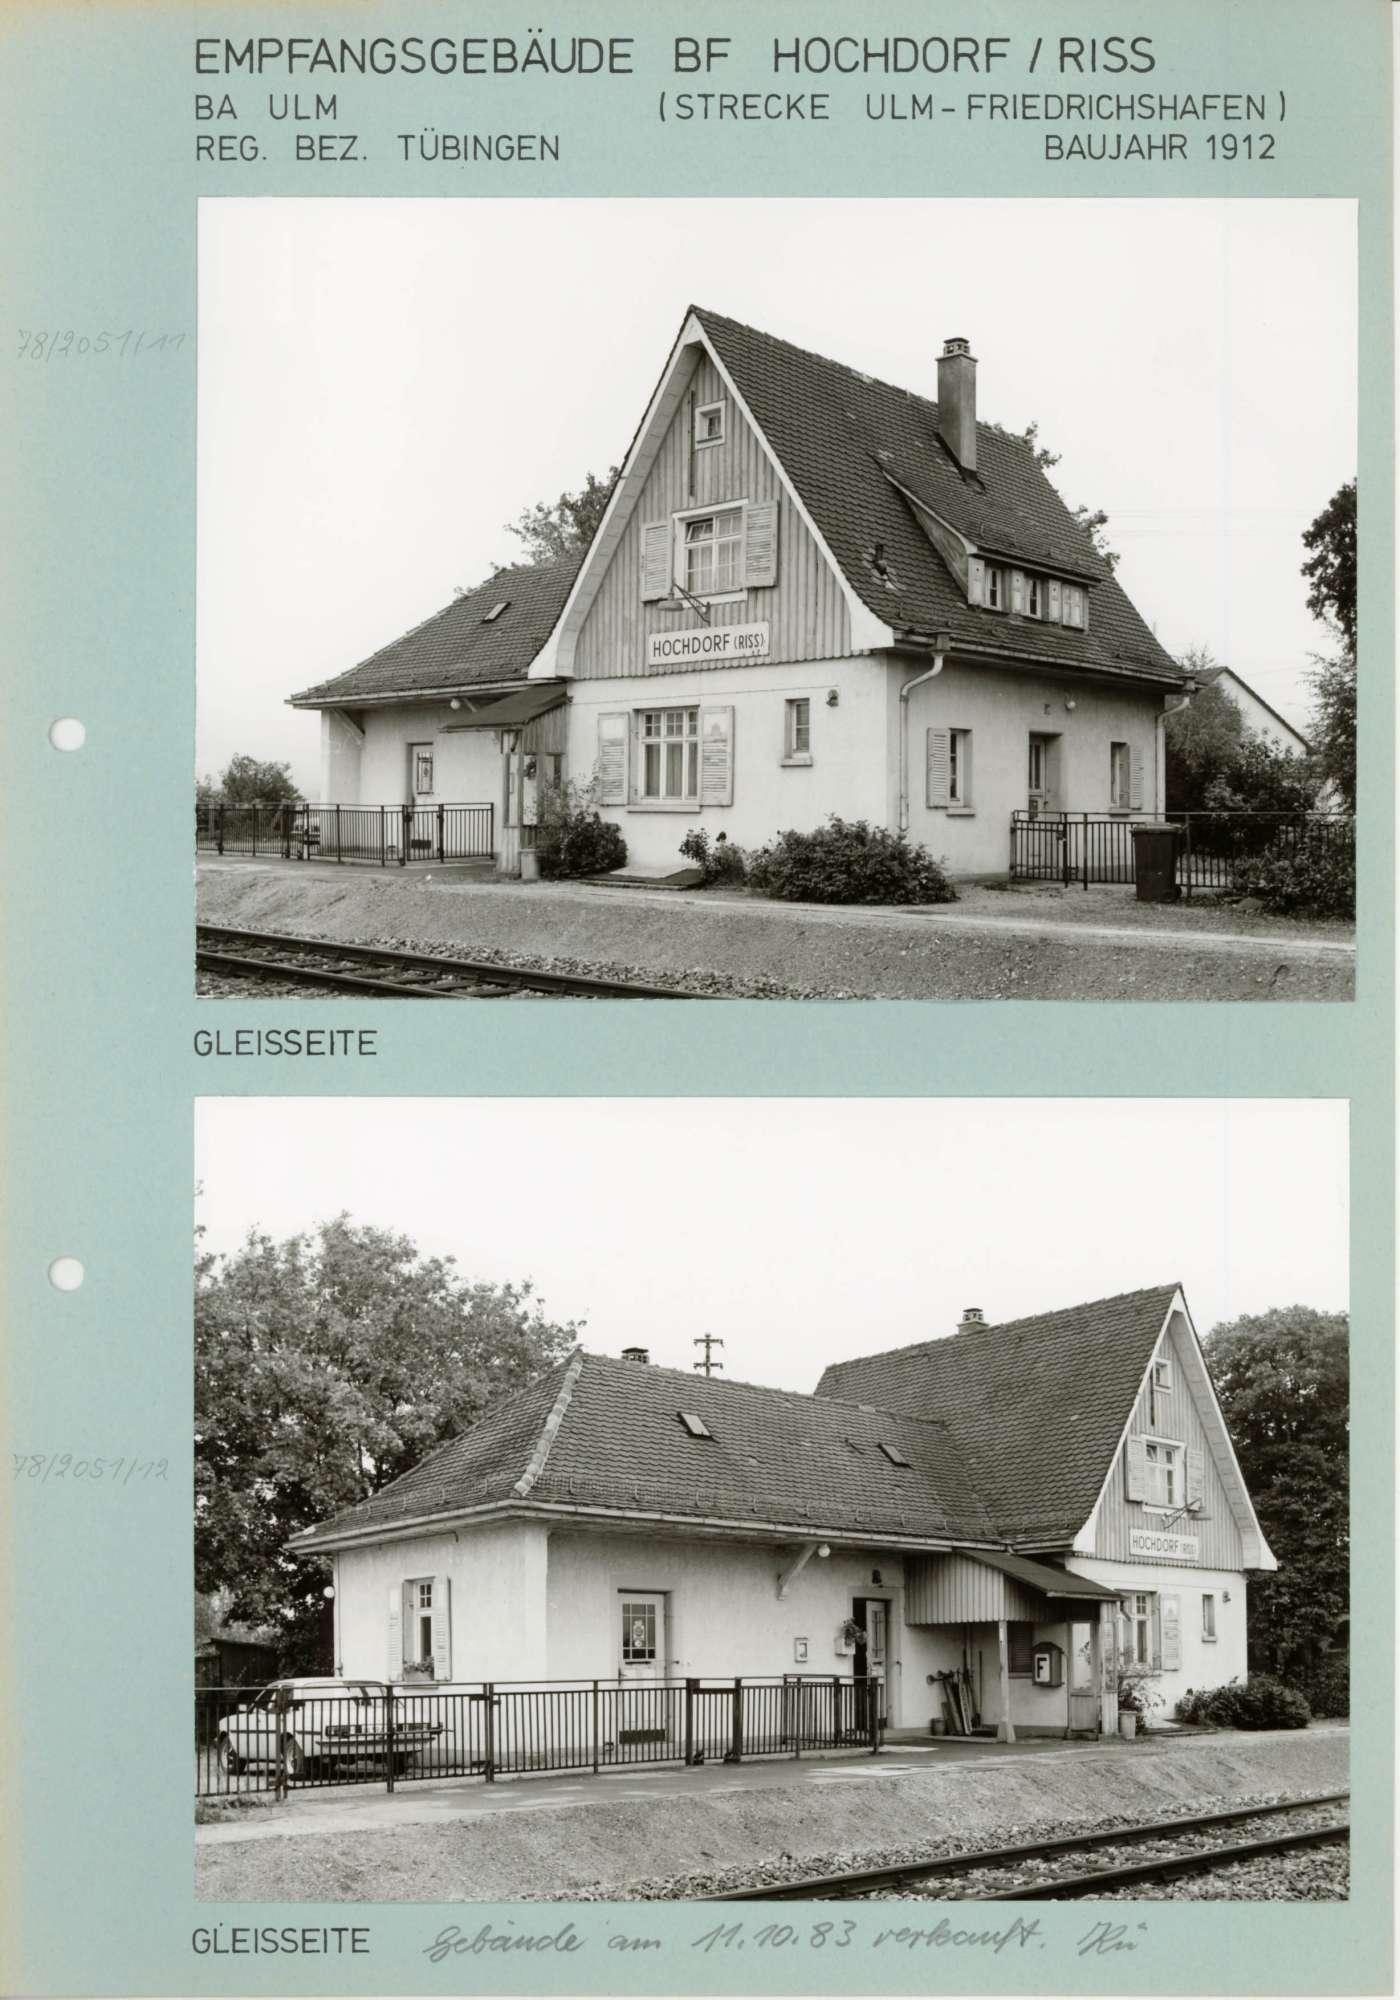 Hochdorf (Riß): 8 Fotos, Bild 2